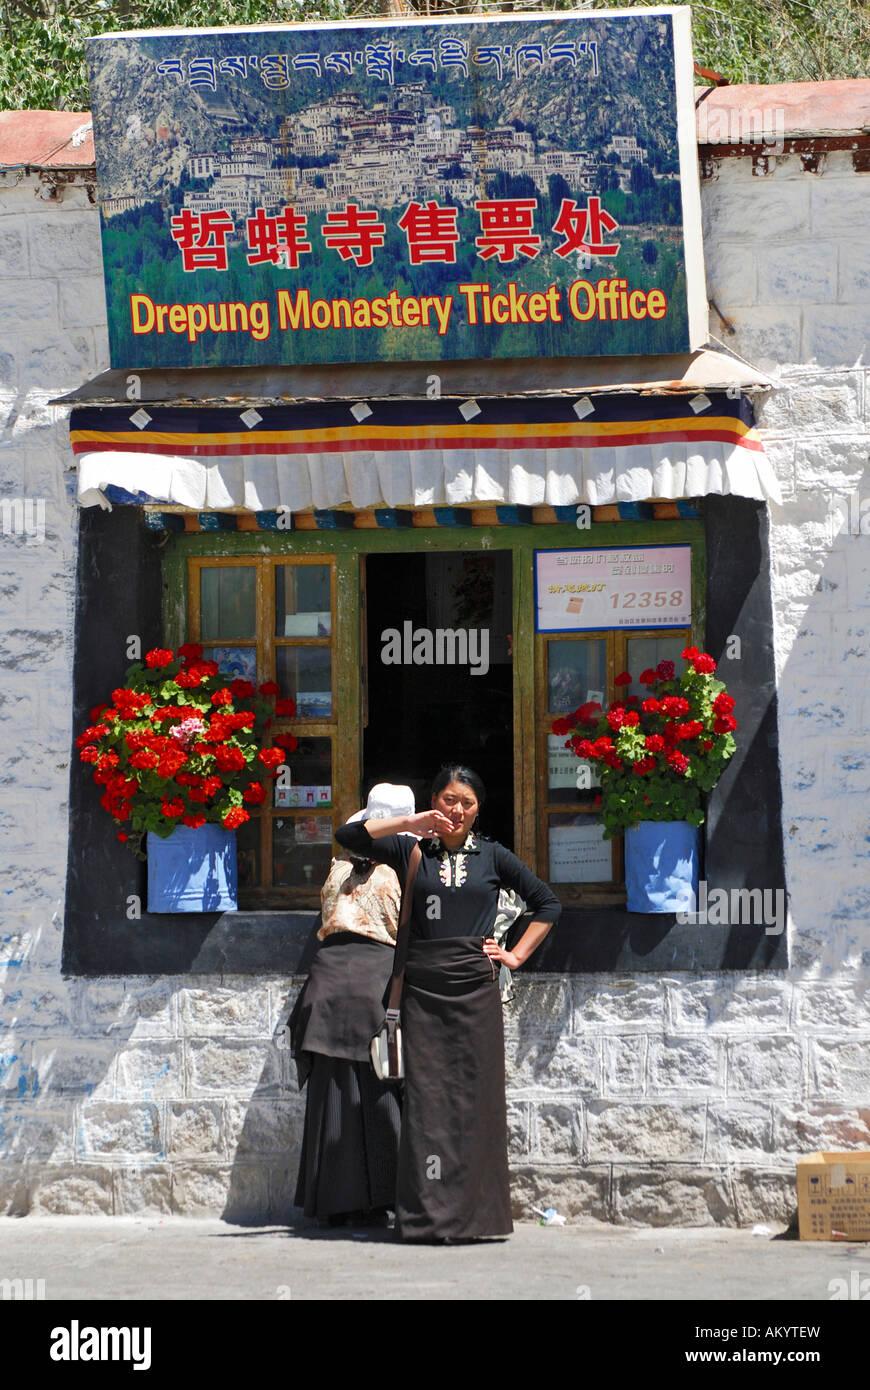 Ticket Office, Drepung monastery near Lhasa, Tibet, Asia Stock Photo